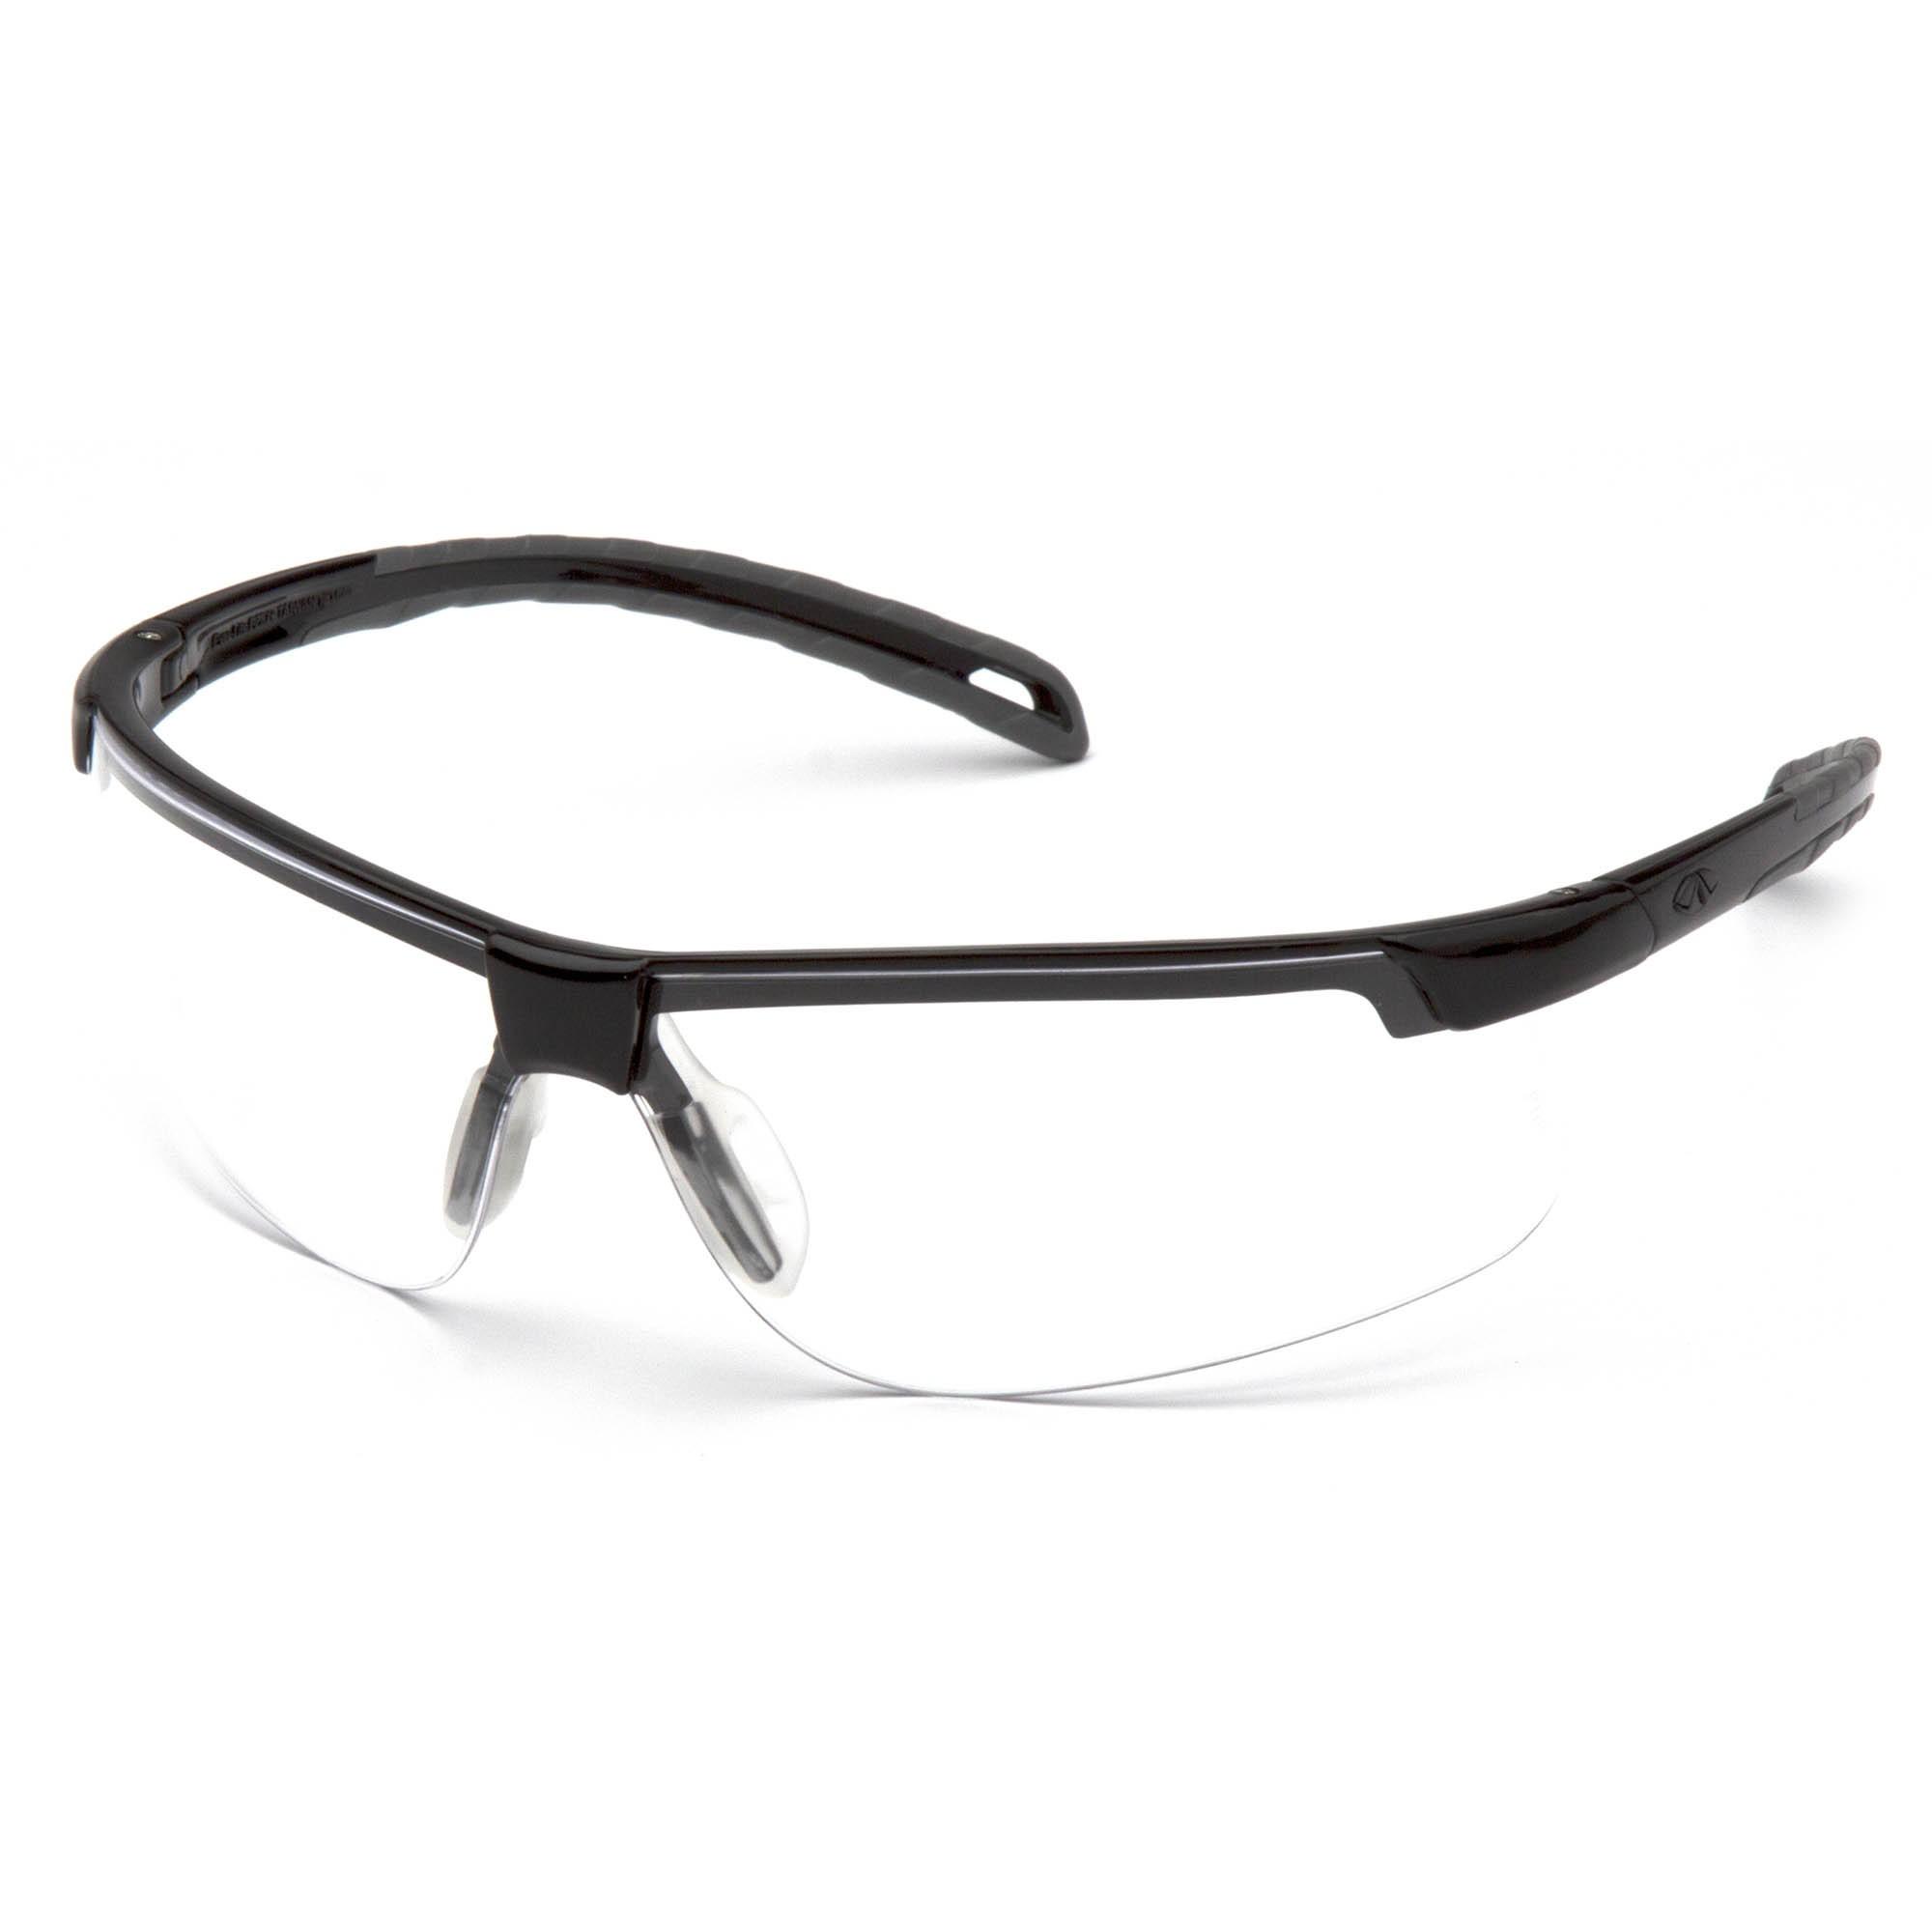 Pyramex Ever-Lite Safety Glasses - Black Frame - Clear ...